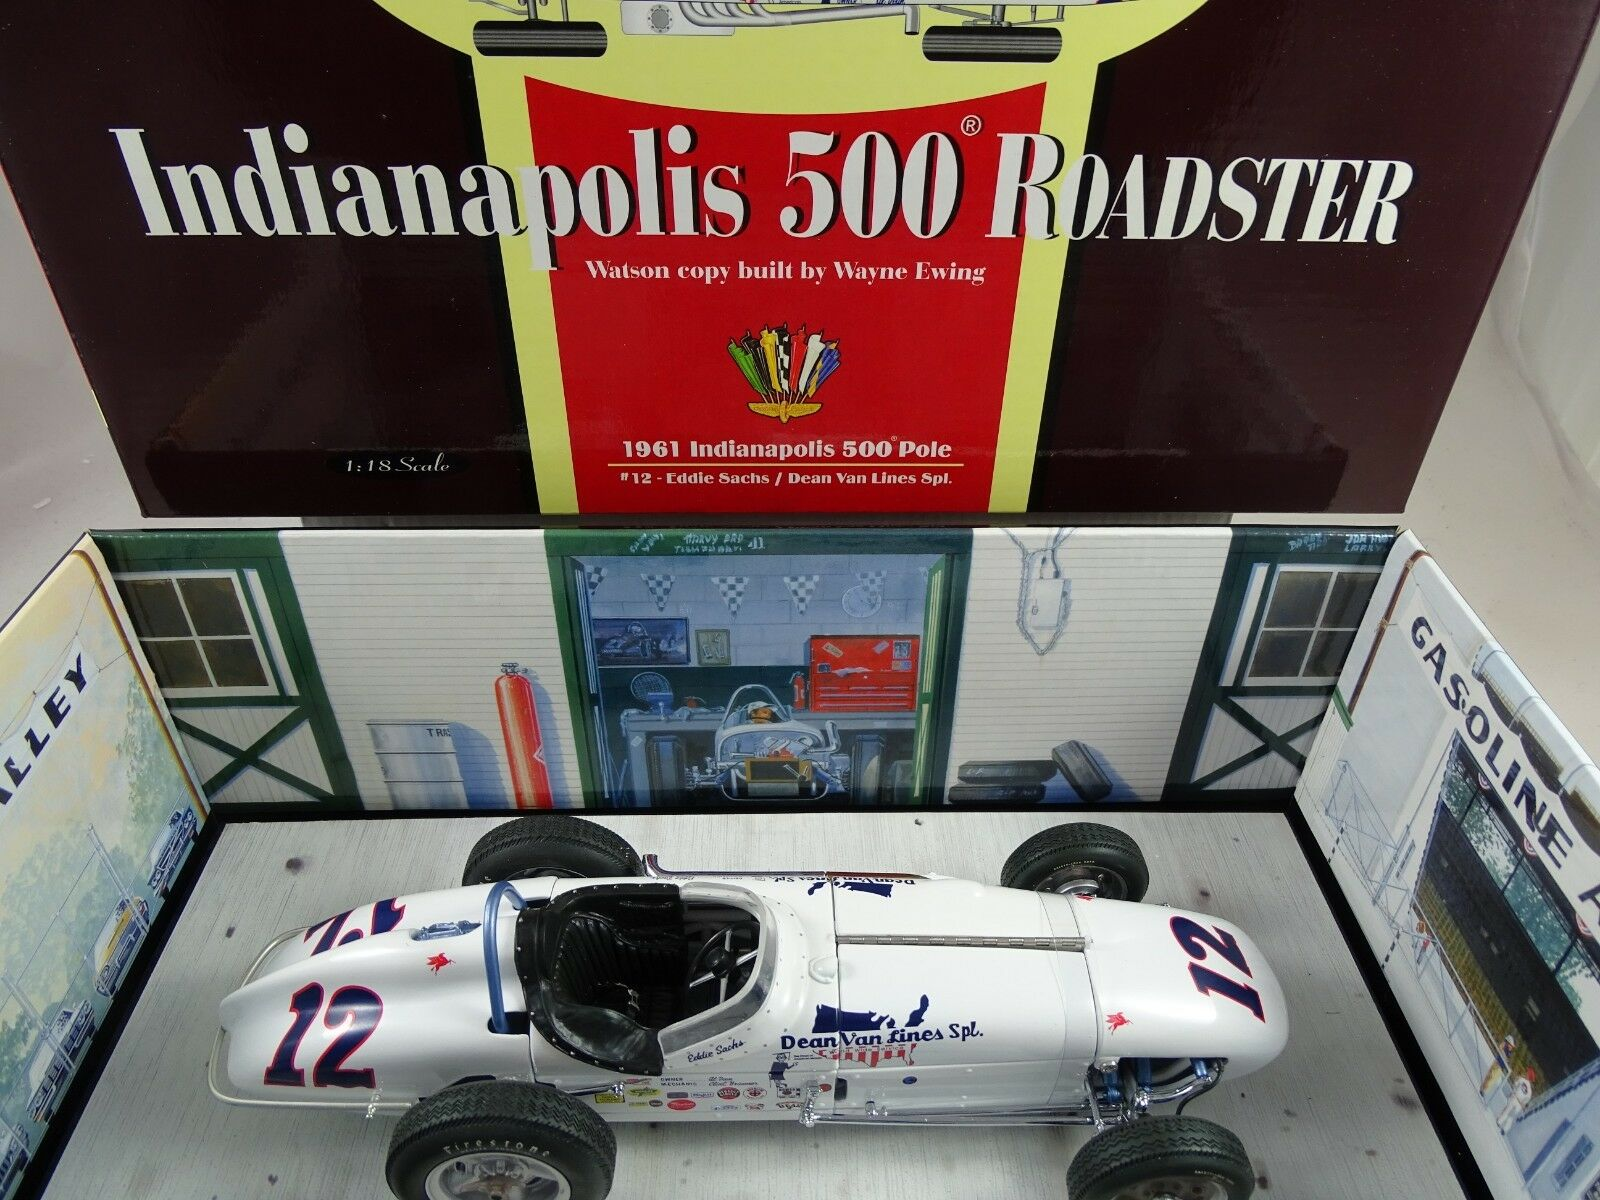 1 18 Carousel Watson Roadster 9161 Indianapolis 500 Polos Rareza§